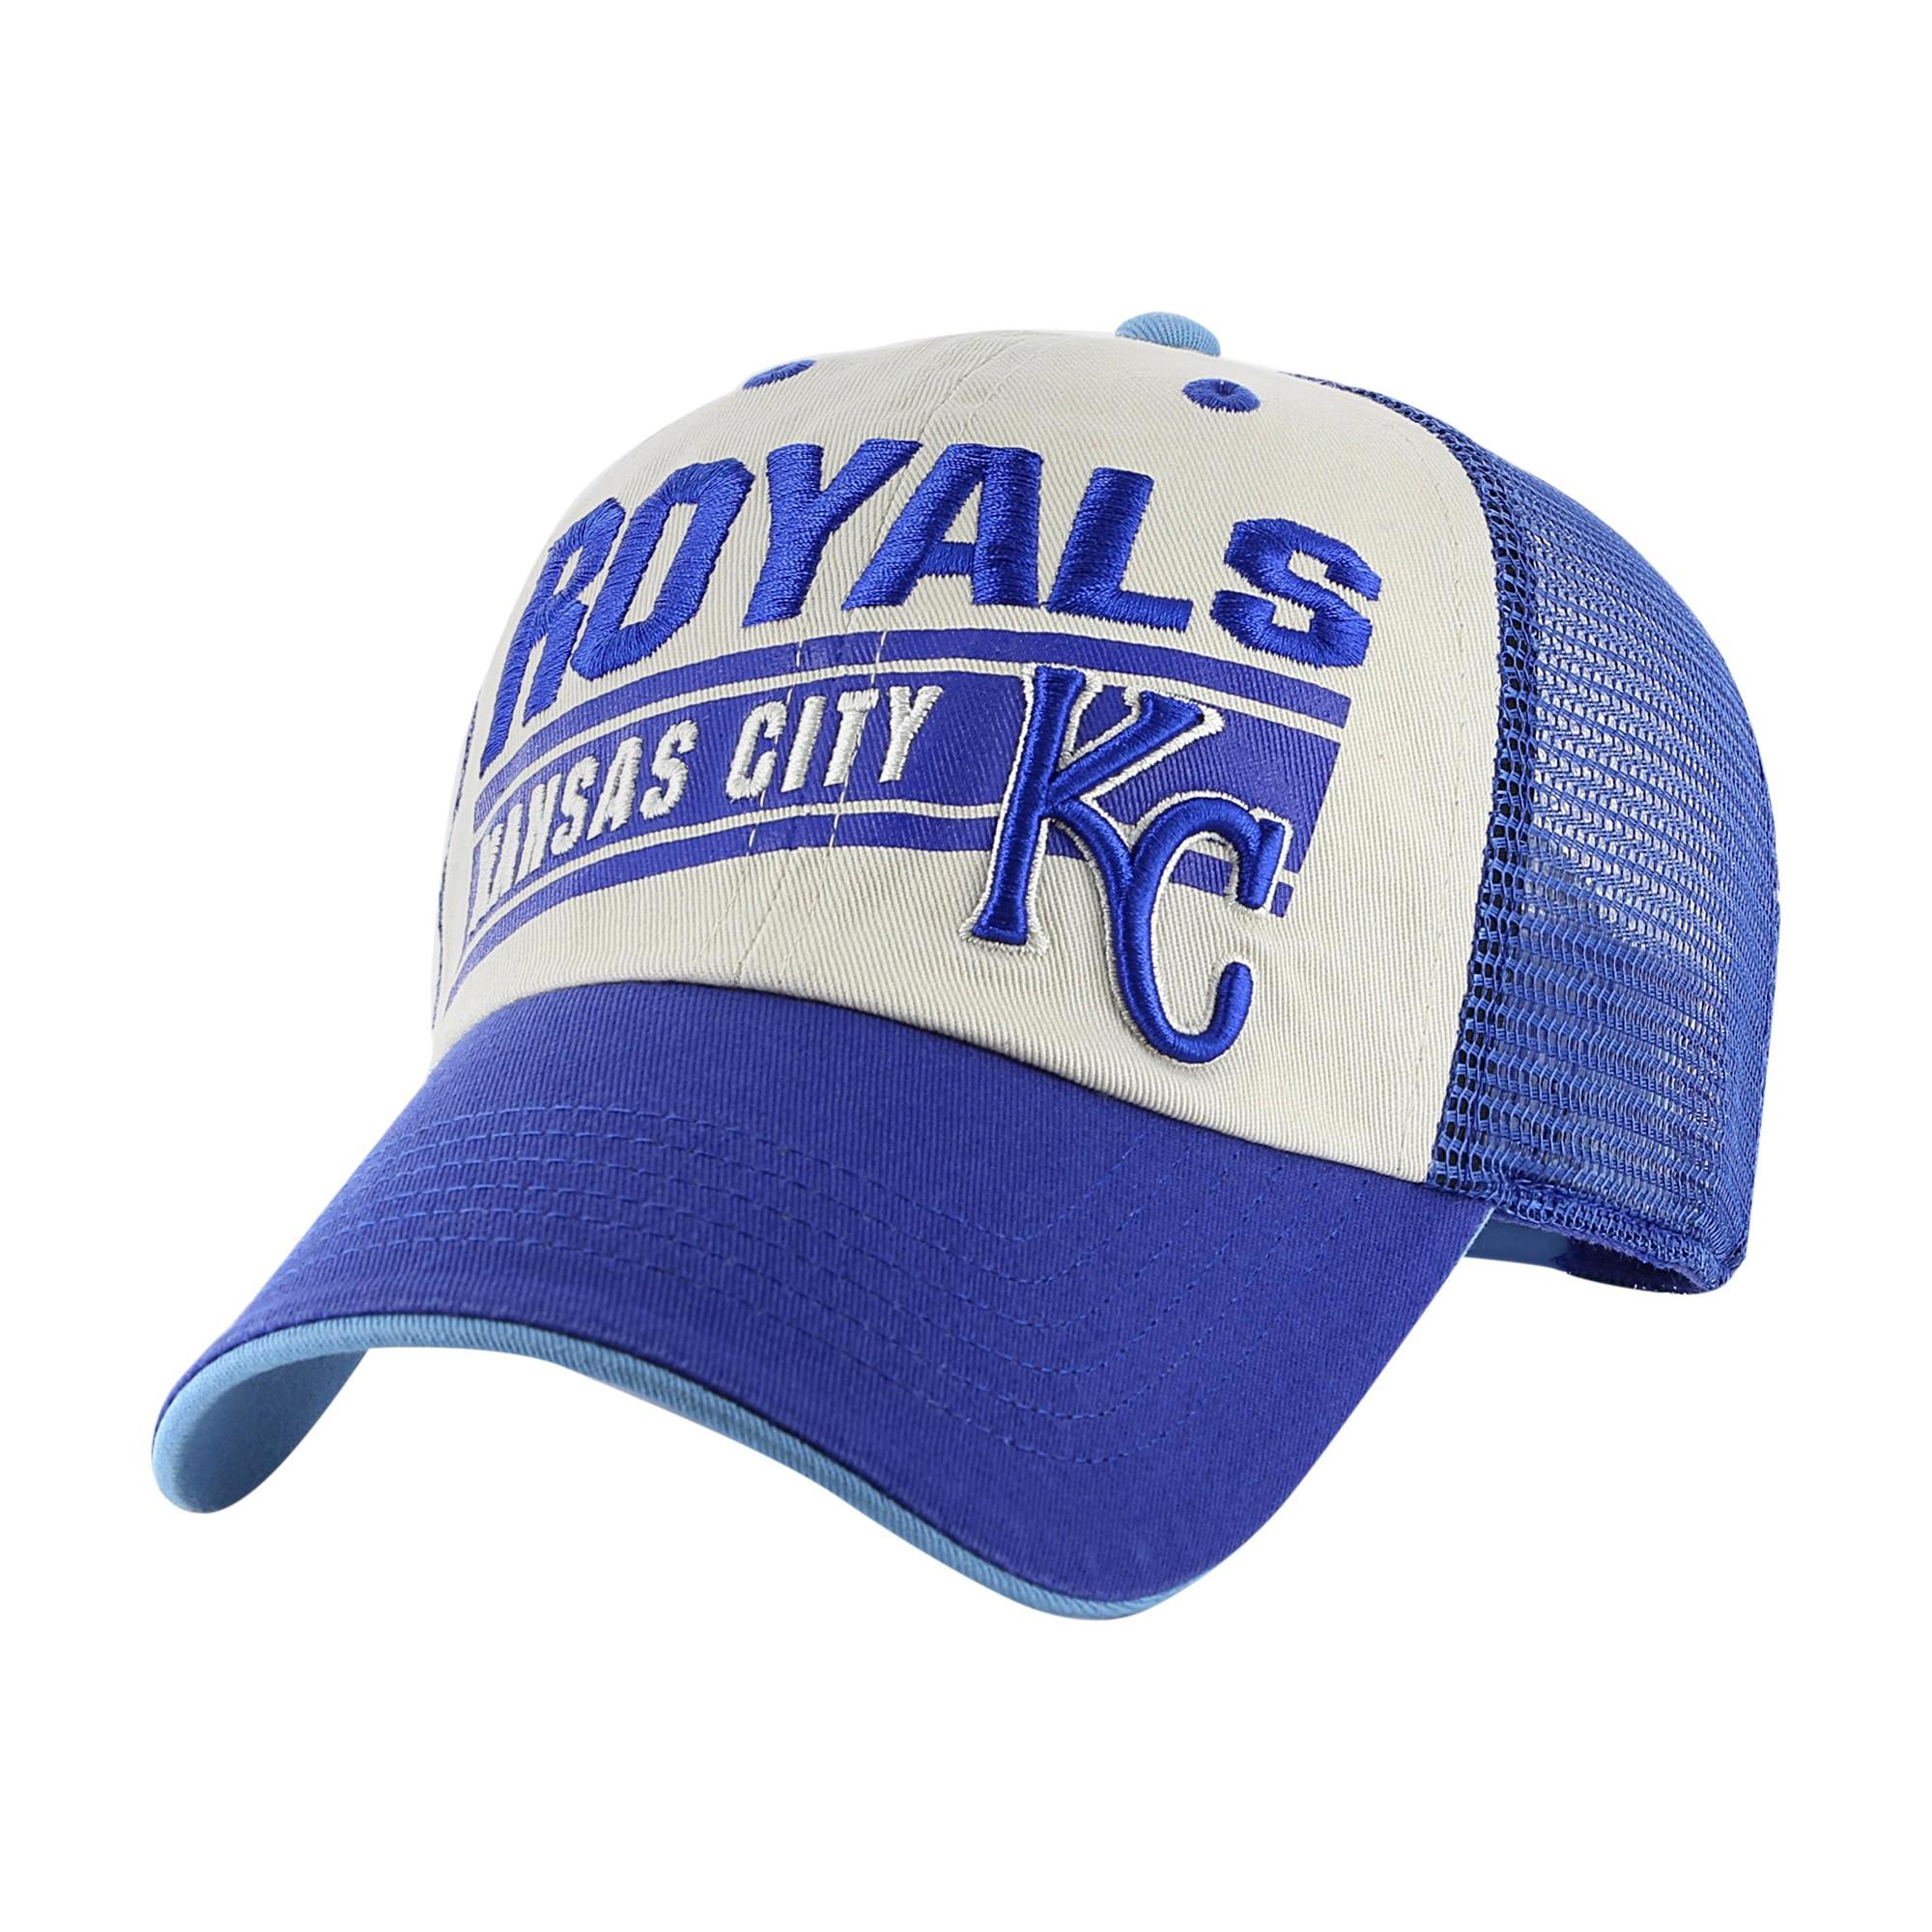 buy popular a2082 90e9a Kansas City Royals Fan Favorite Raster Adjustable Baseball Cap, Kids Unisex